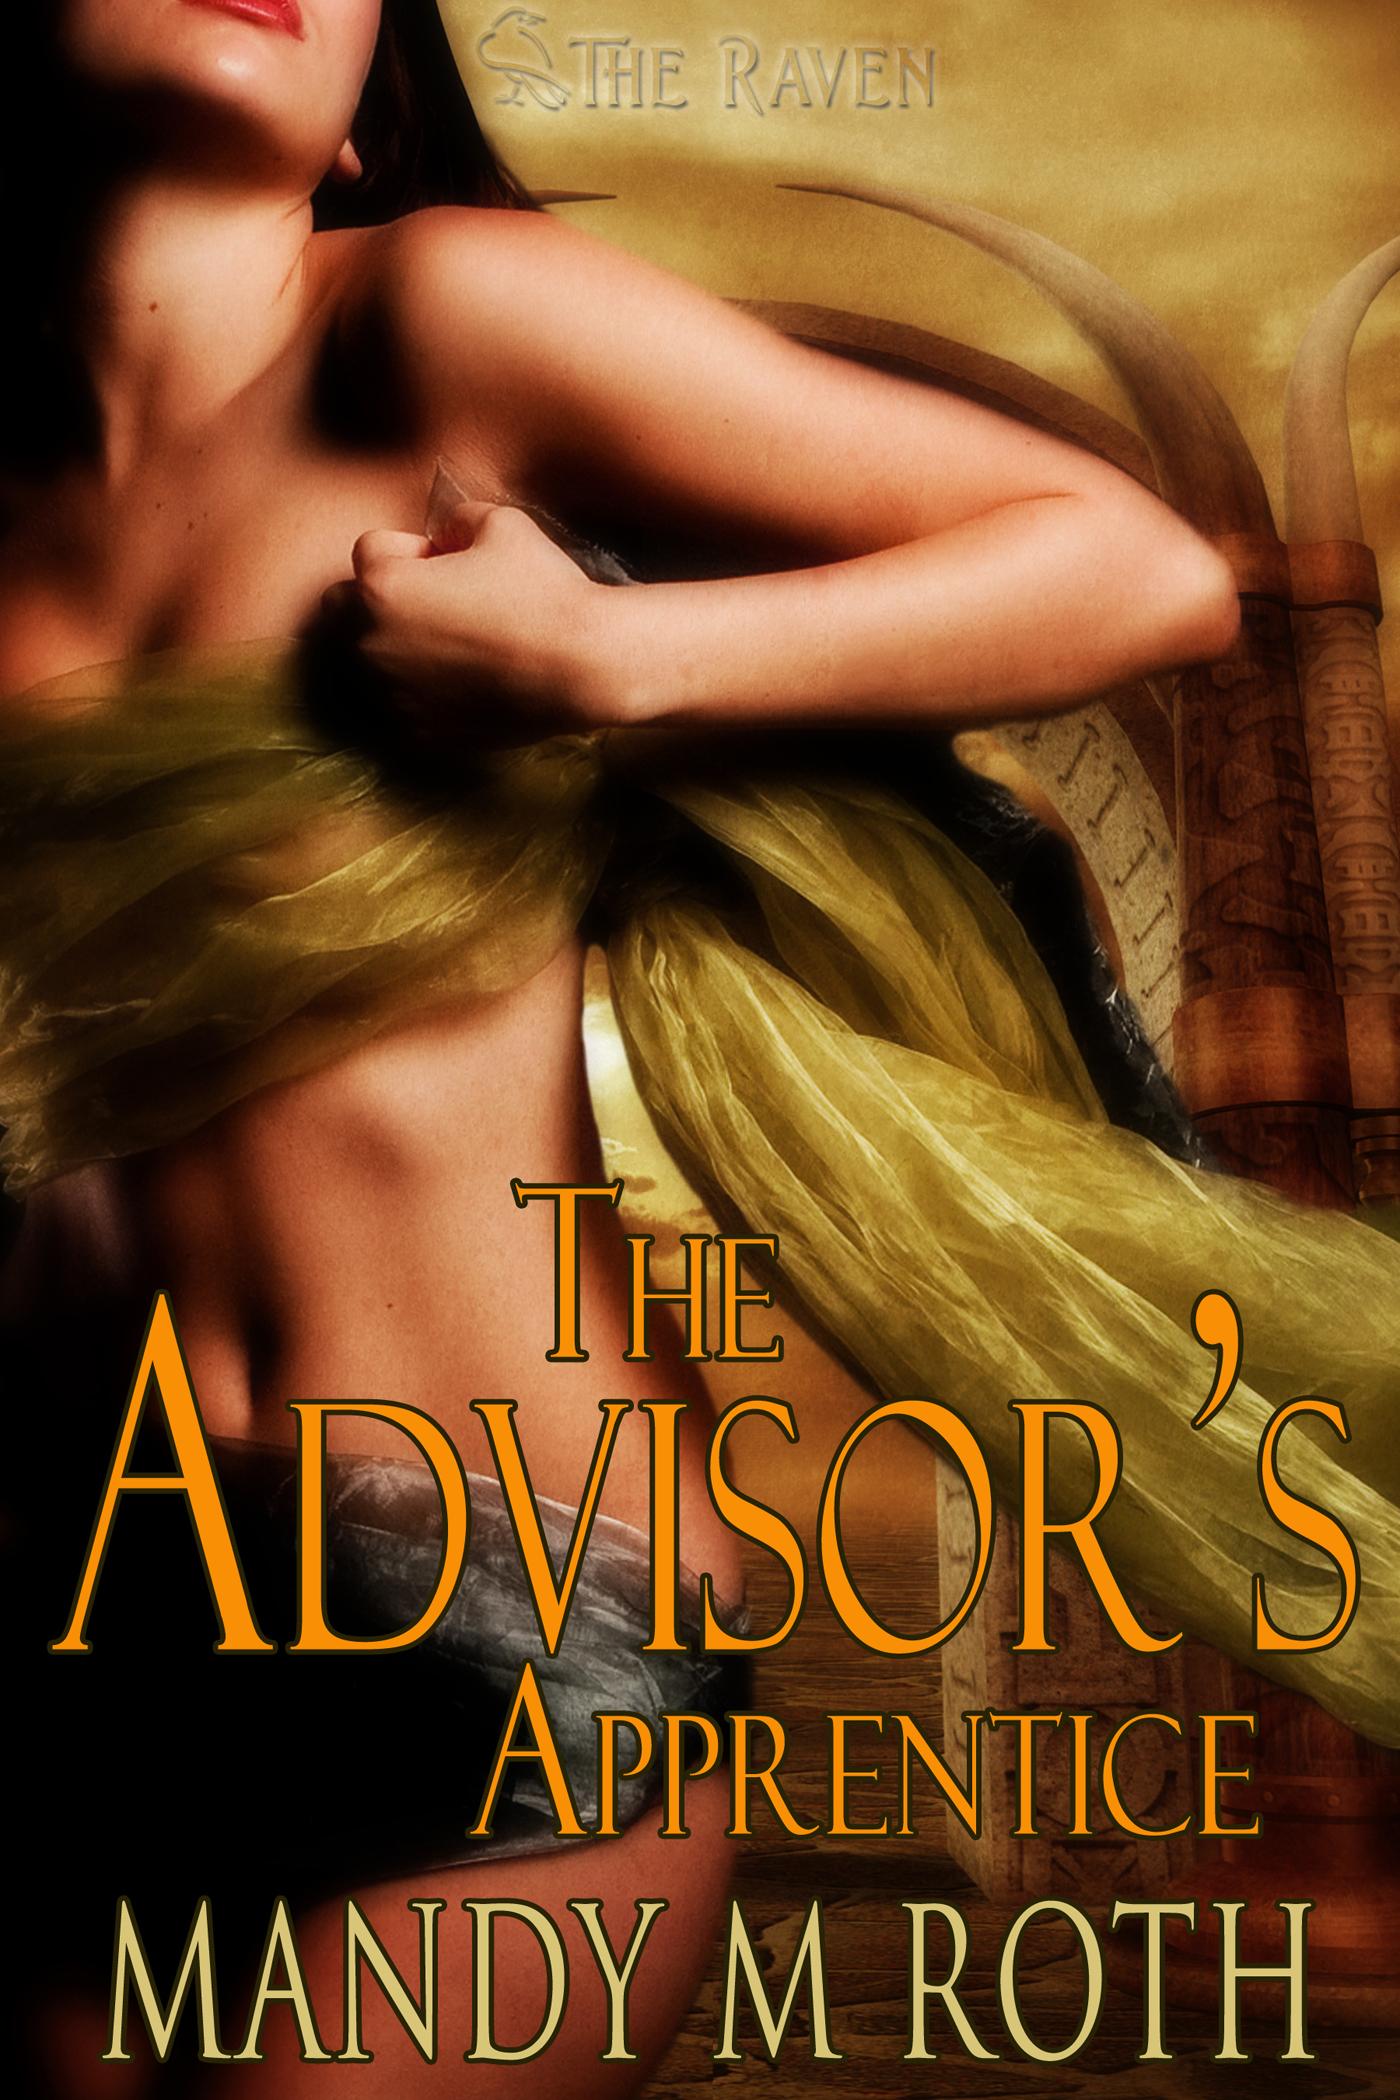 Mandy M. Roth - The Advisor's Apprentice (King's Choice II)